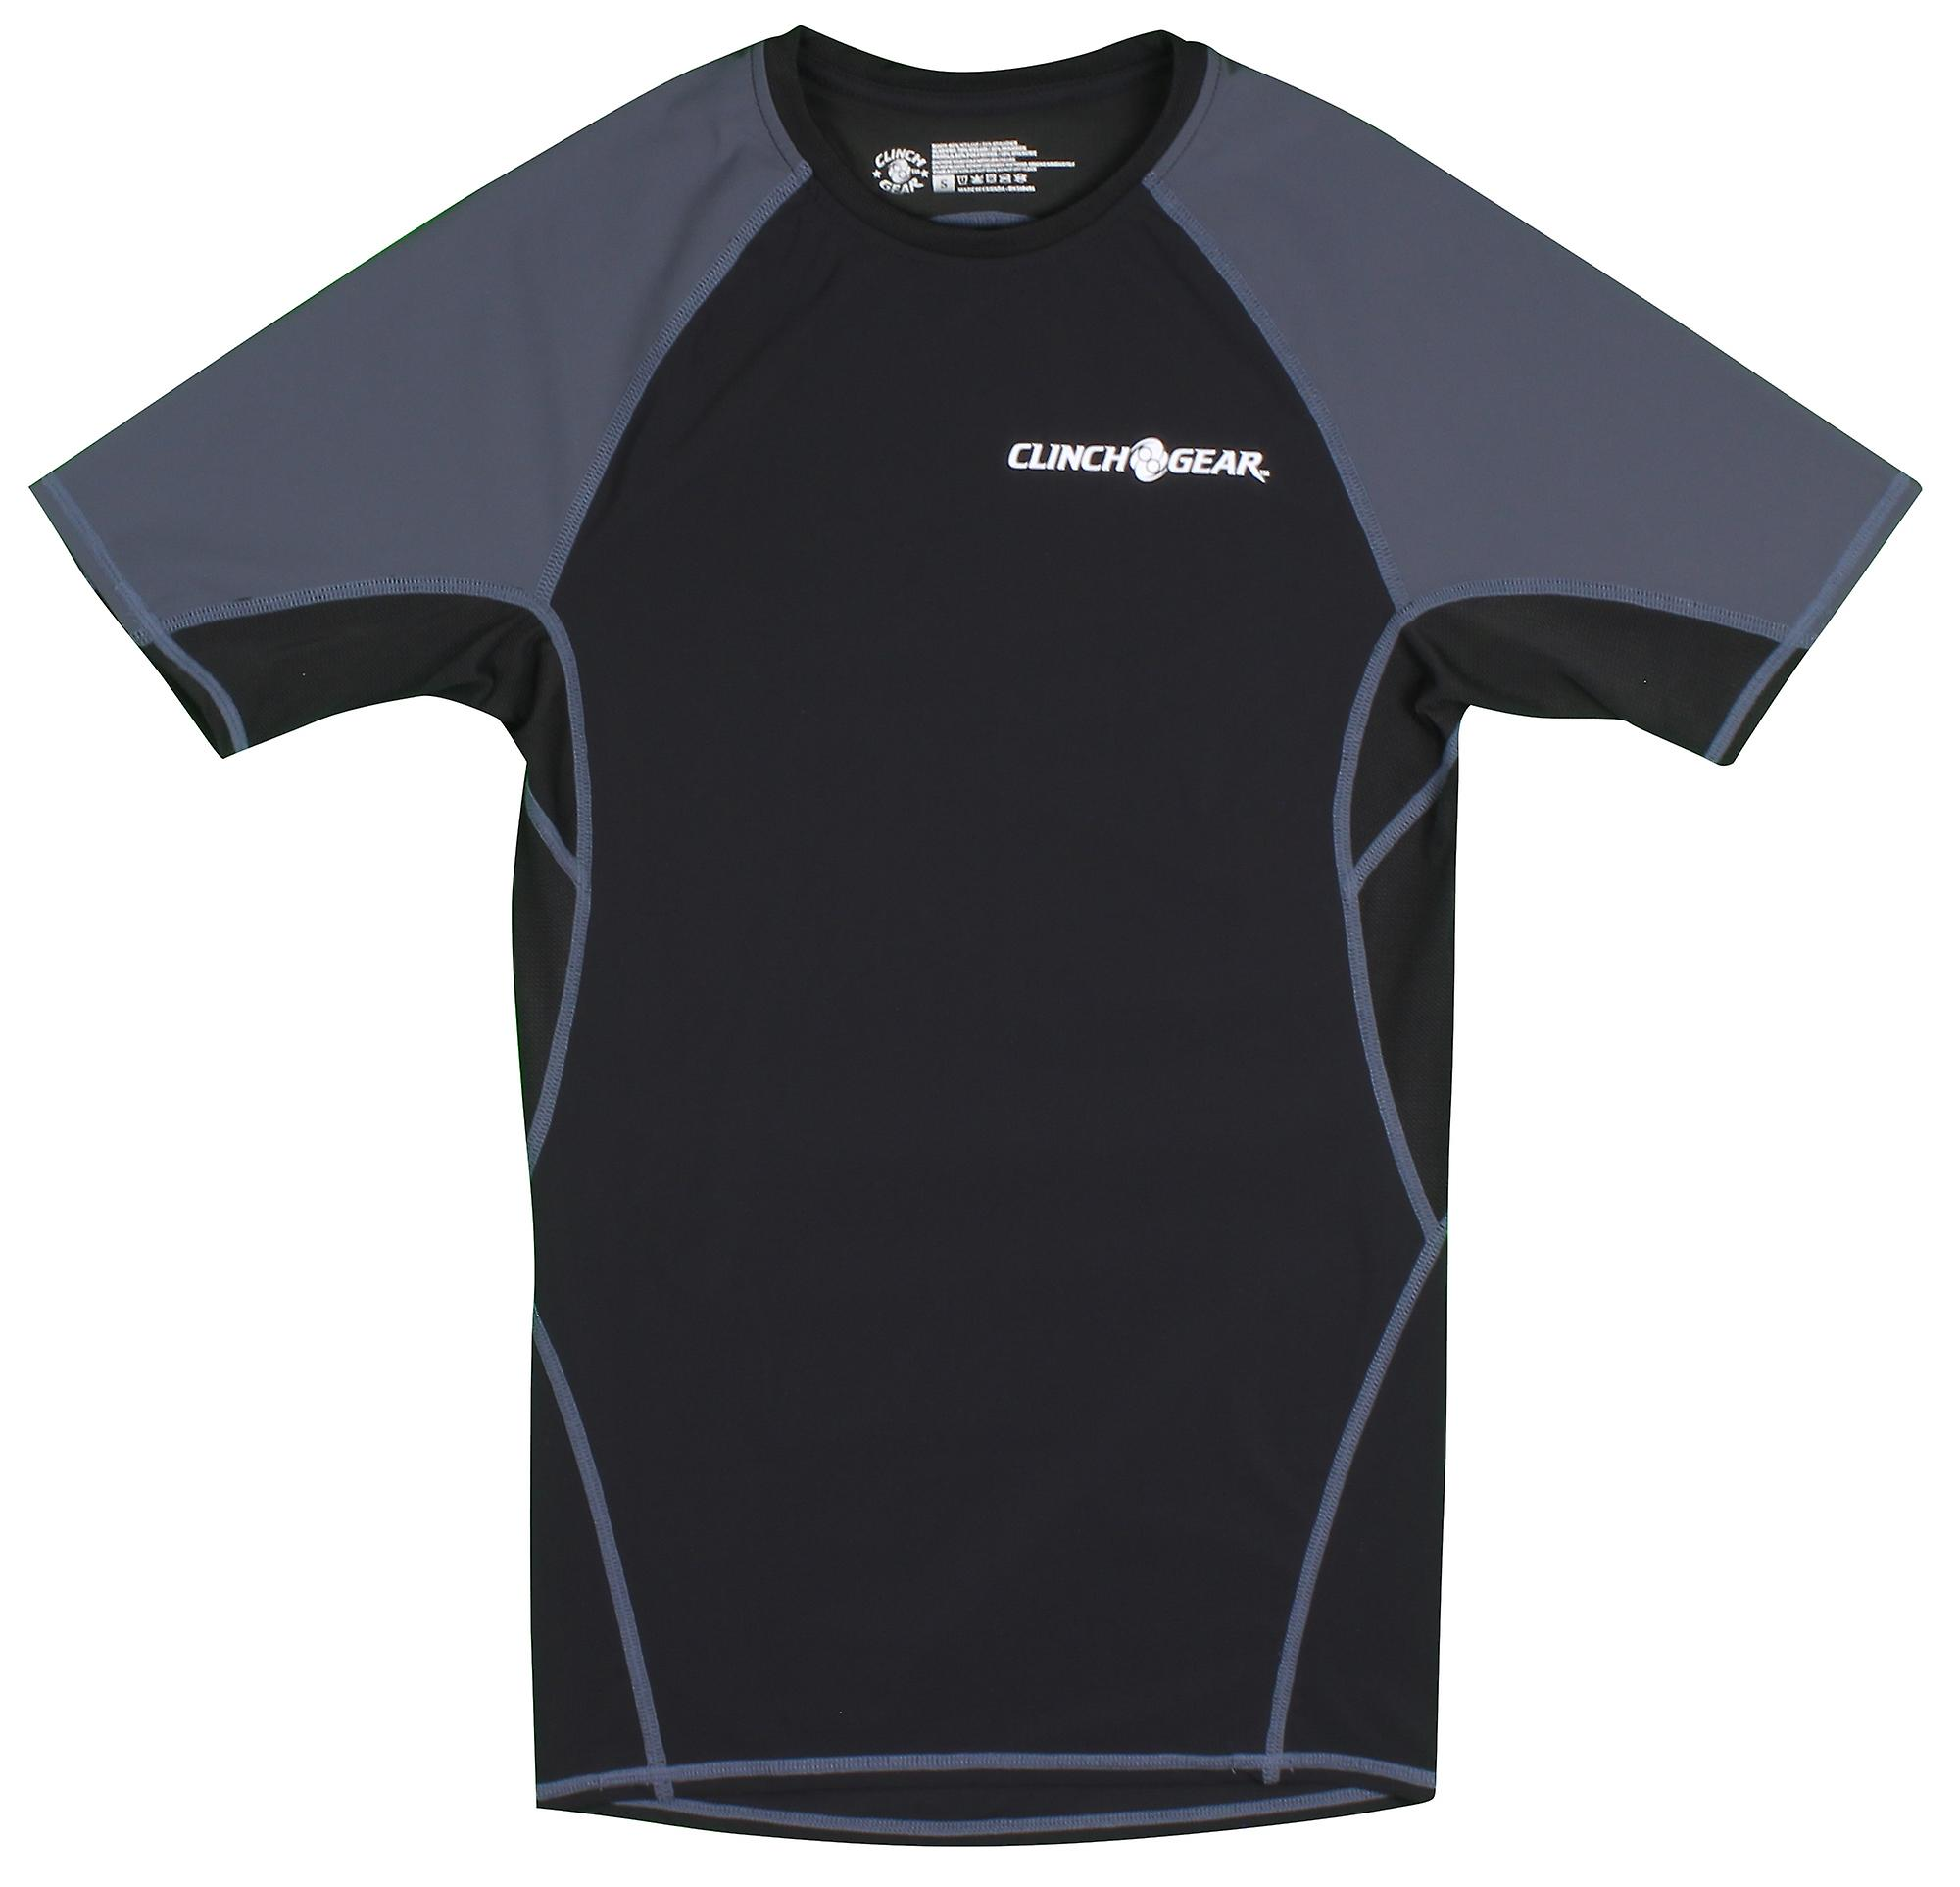 Clinch Gear Mens React Short Sleeve MMA Wrestling Rashguard - Black/Gray